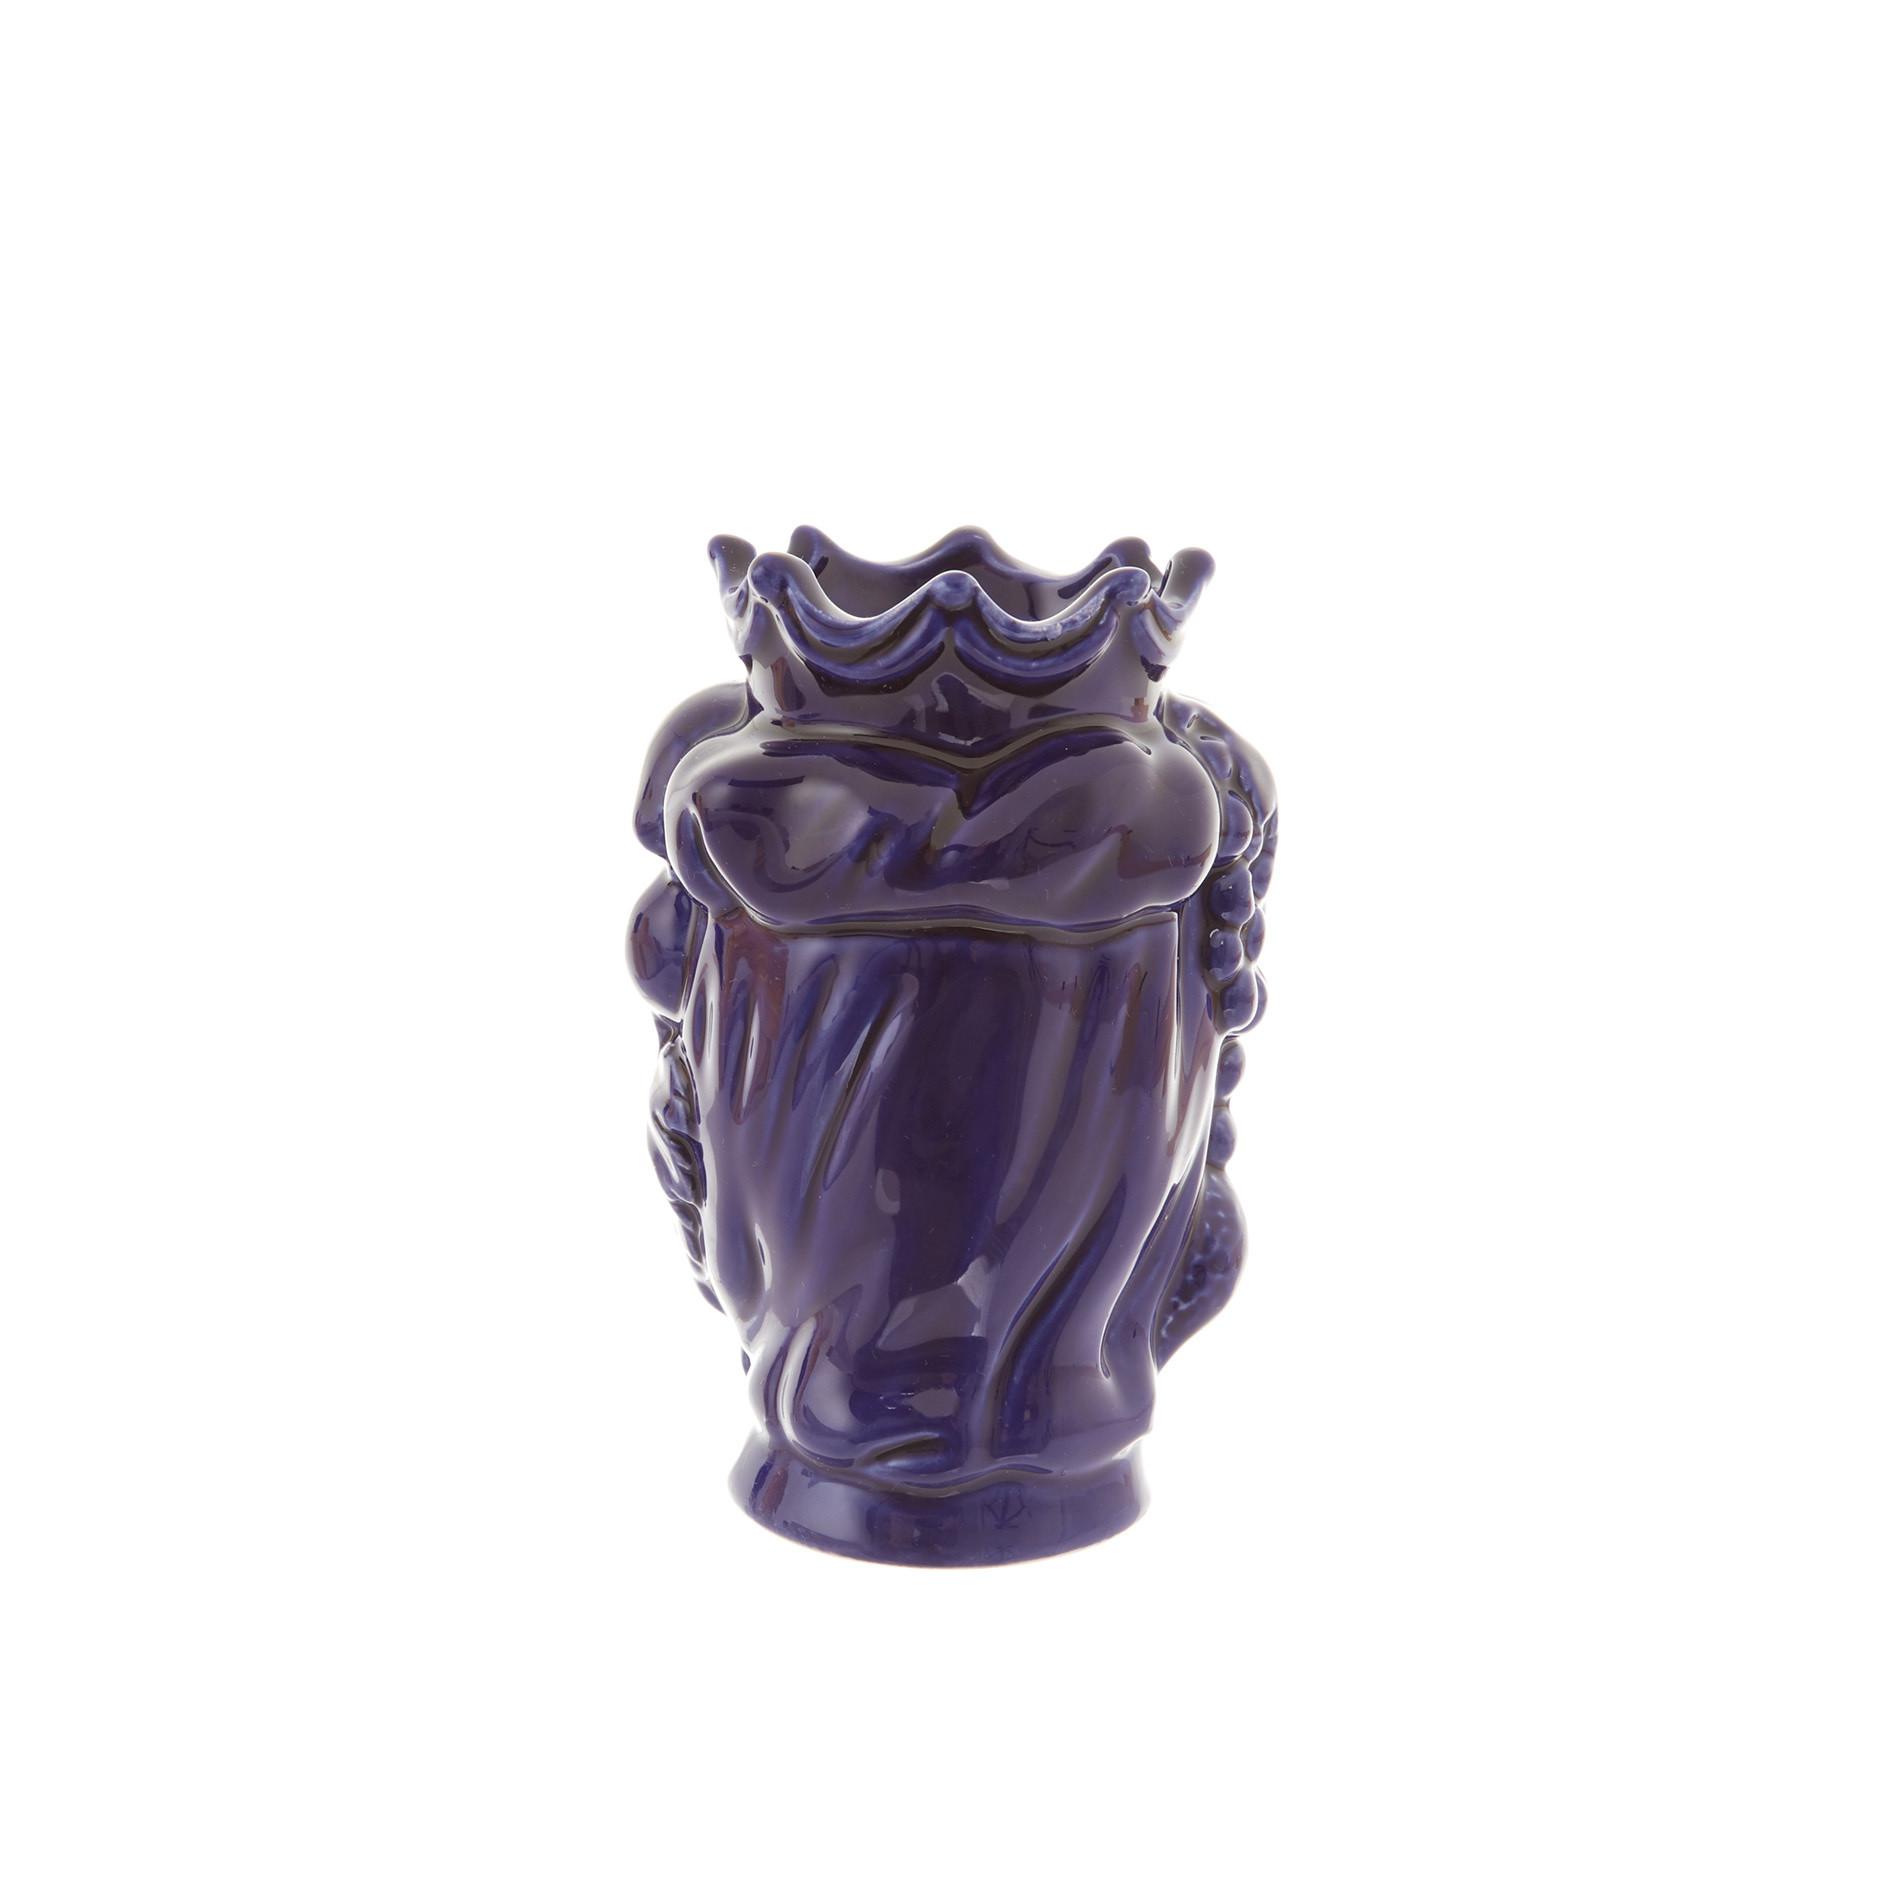 Testa di moro by Ceramiche Siciliane Ruggeri, Blu, large image number 2